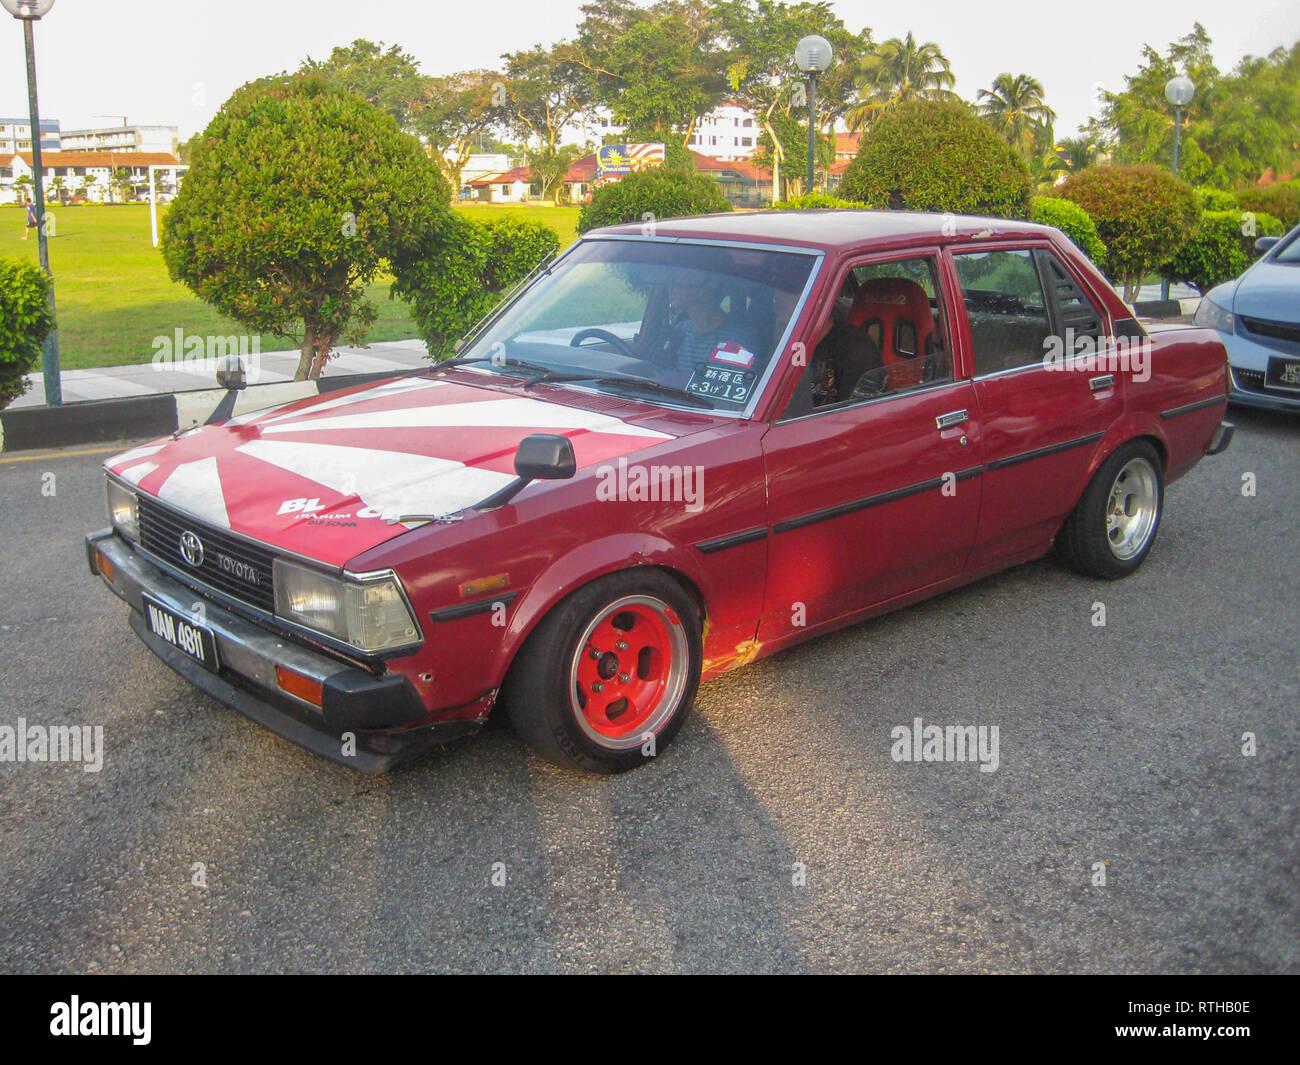 Kelebihan Toyota Corolla Classic Harga